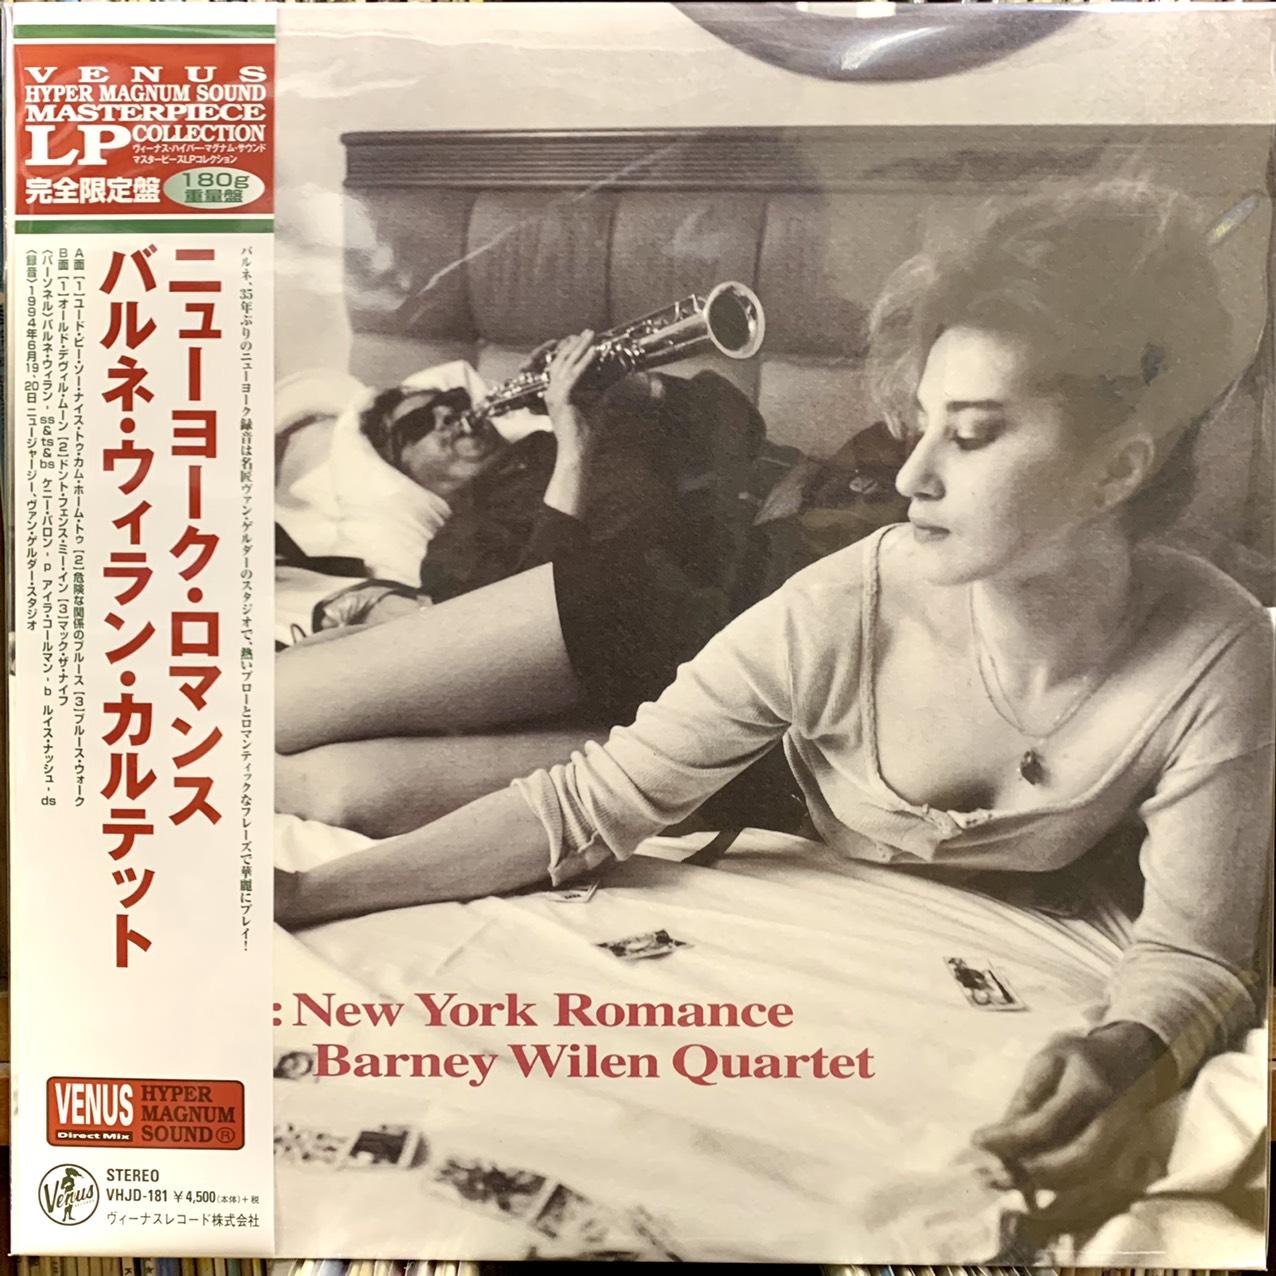 dia-than-vinyl-la-ca-new-york-romance-barney-wilen-quartet